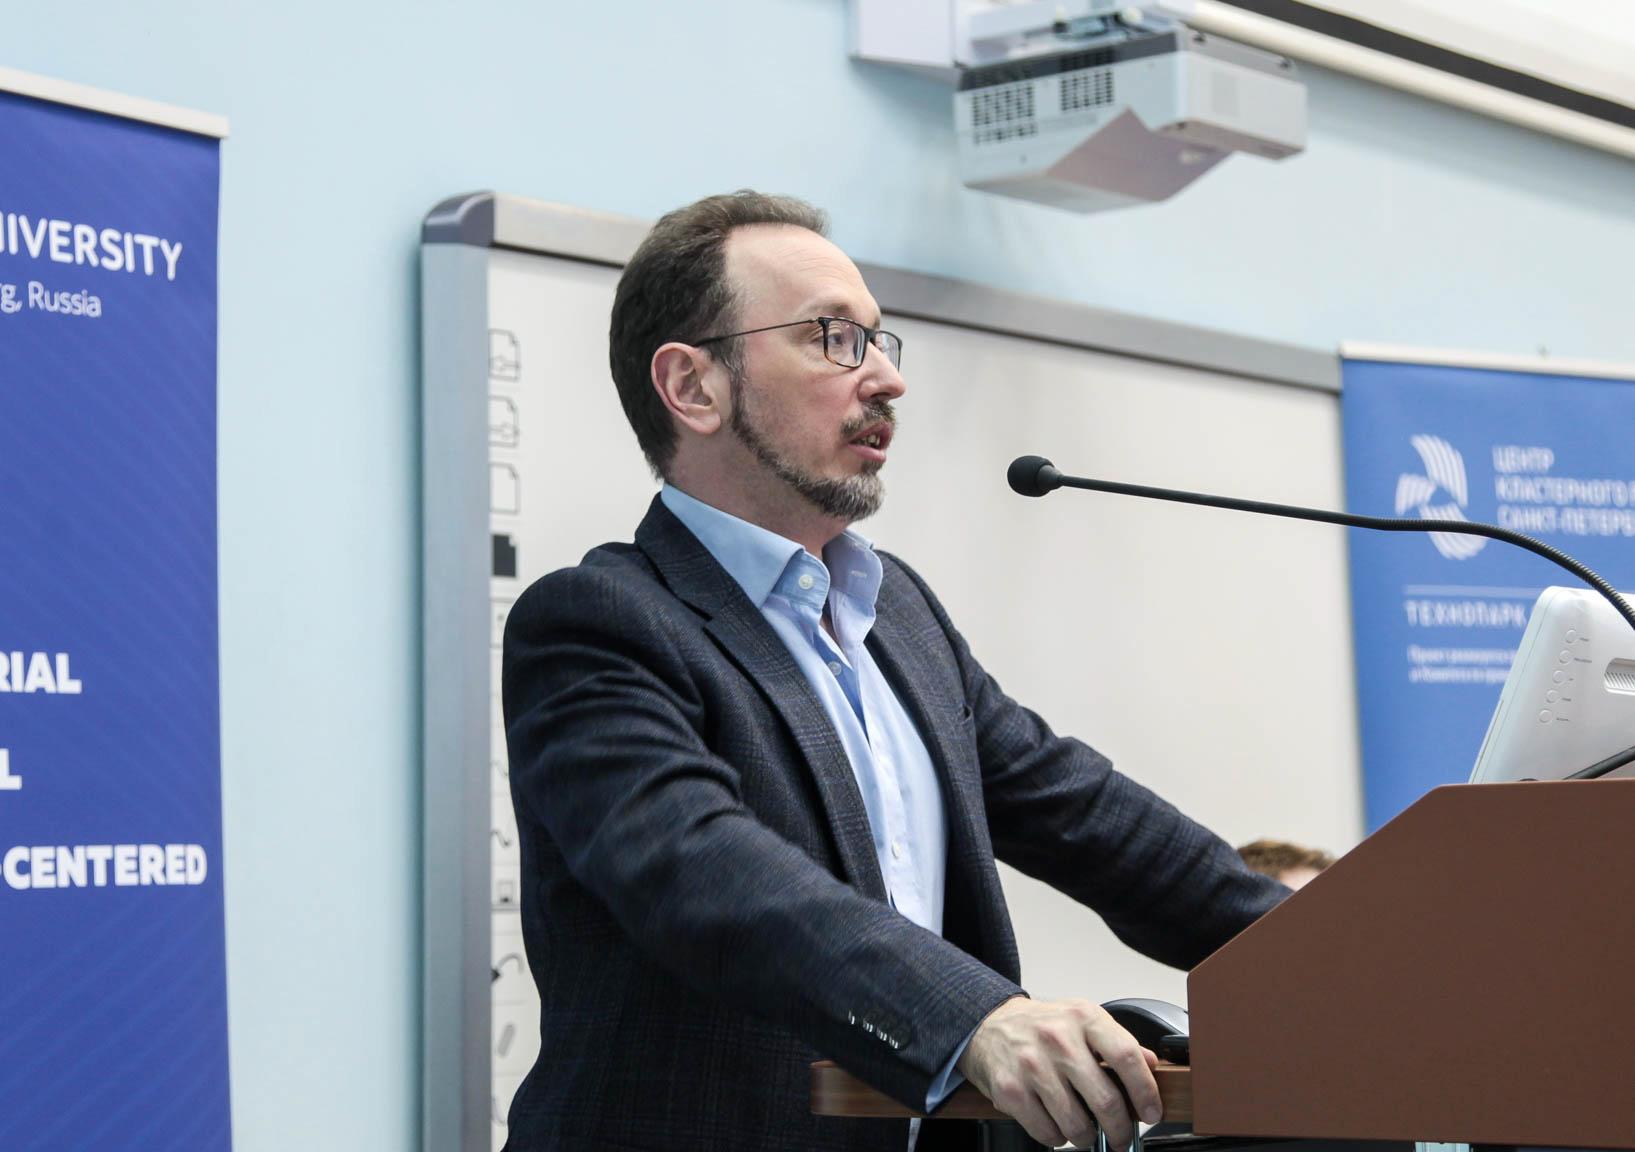 Evgeny Kuznetsov, CEO of Russian Venture Company